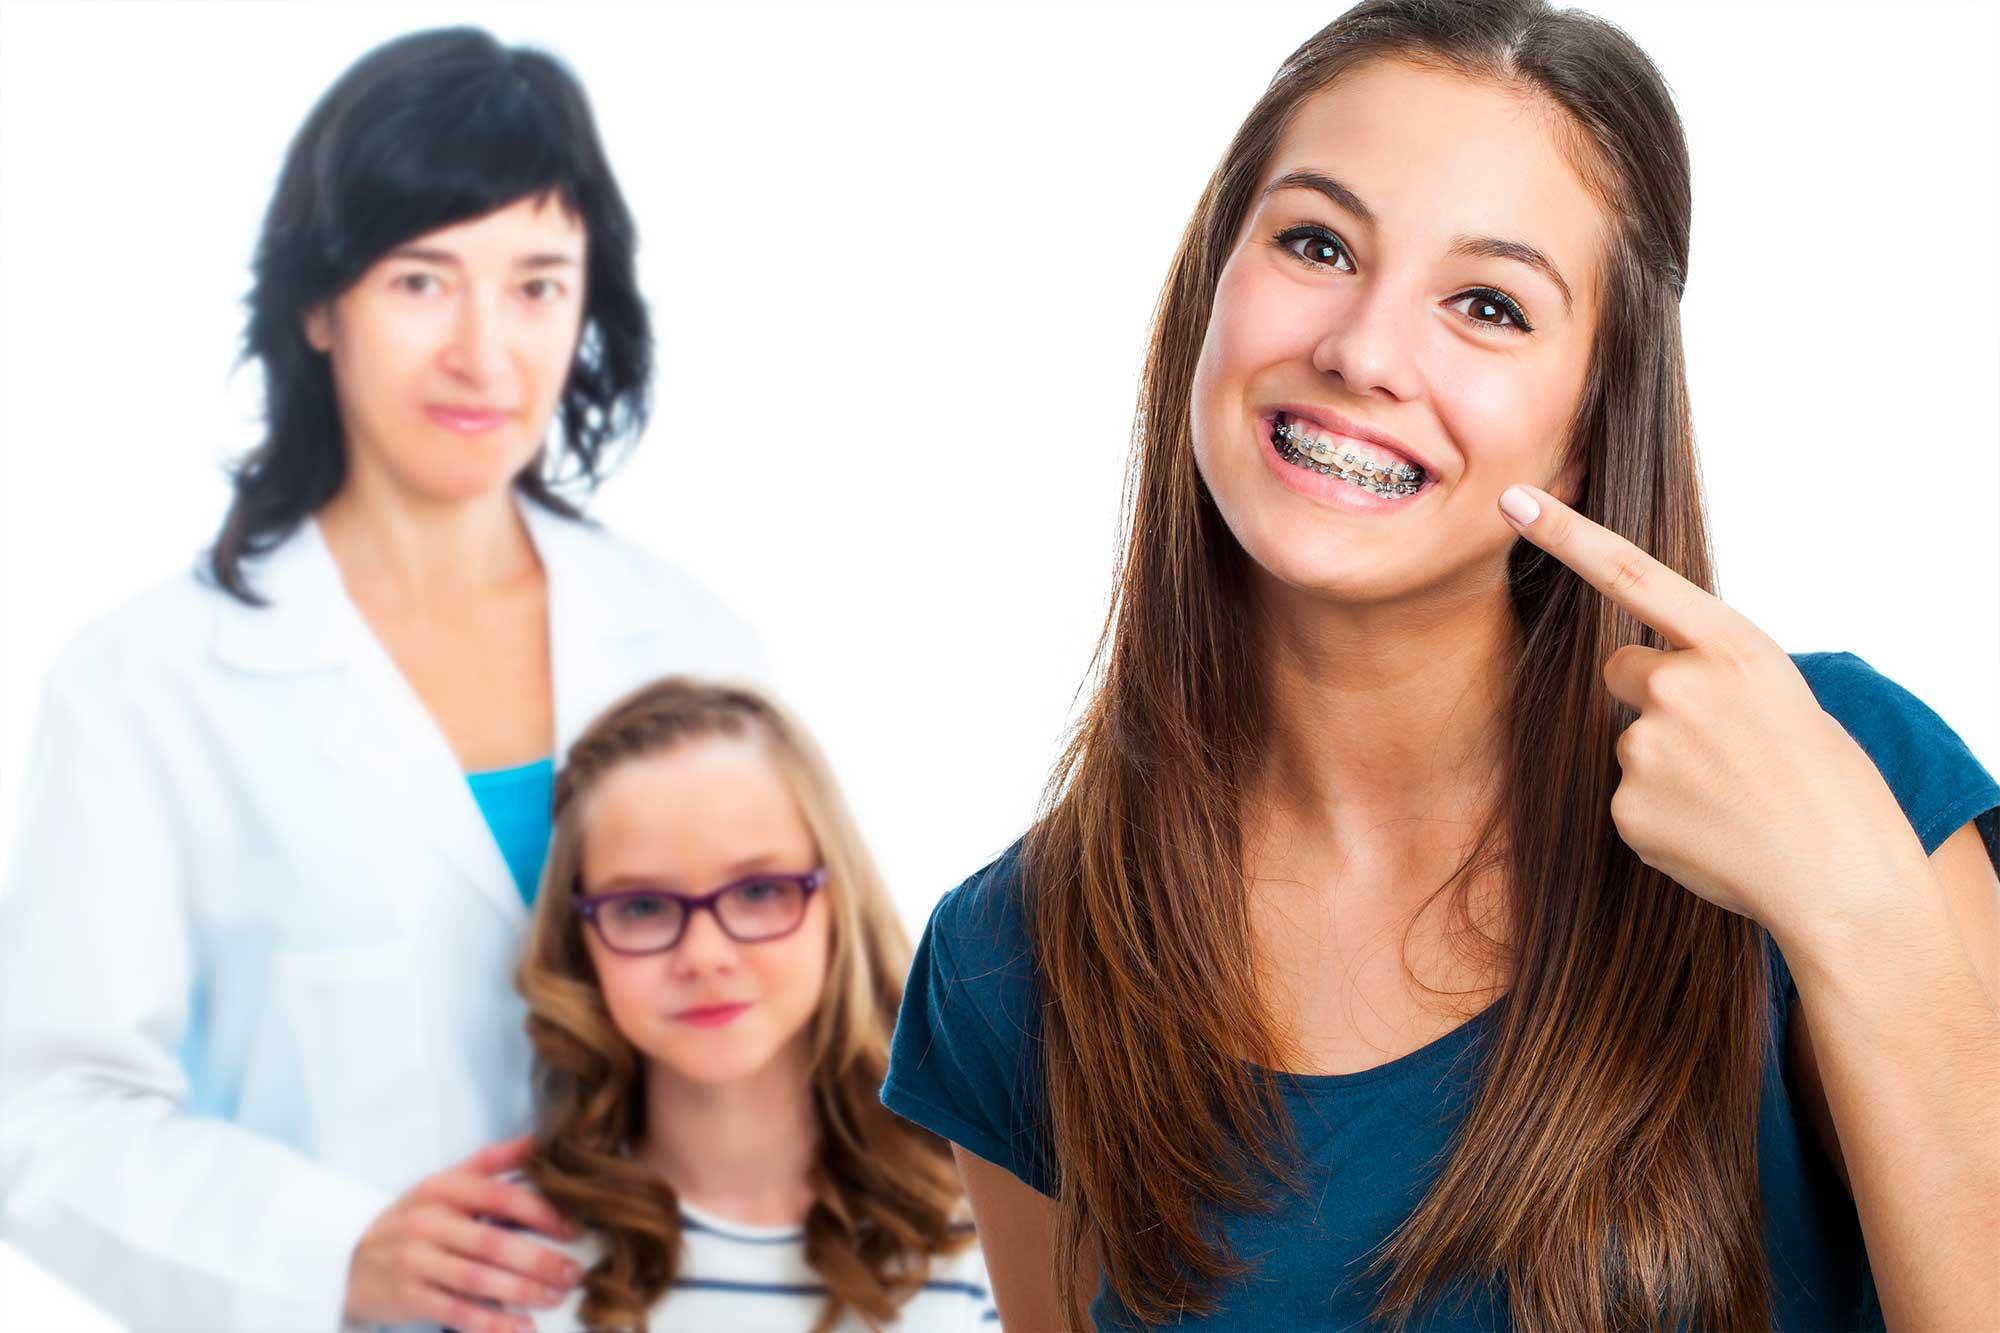 http://www.studiosmilecare.it/wp-content/uploads/2015/12/ortodonzia.jpg